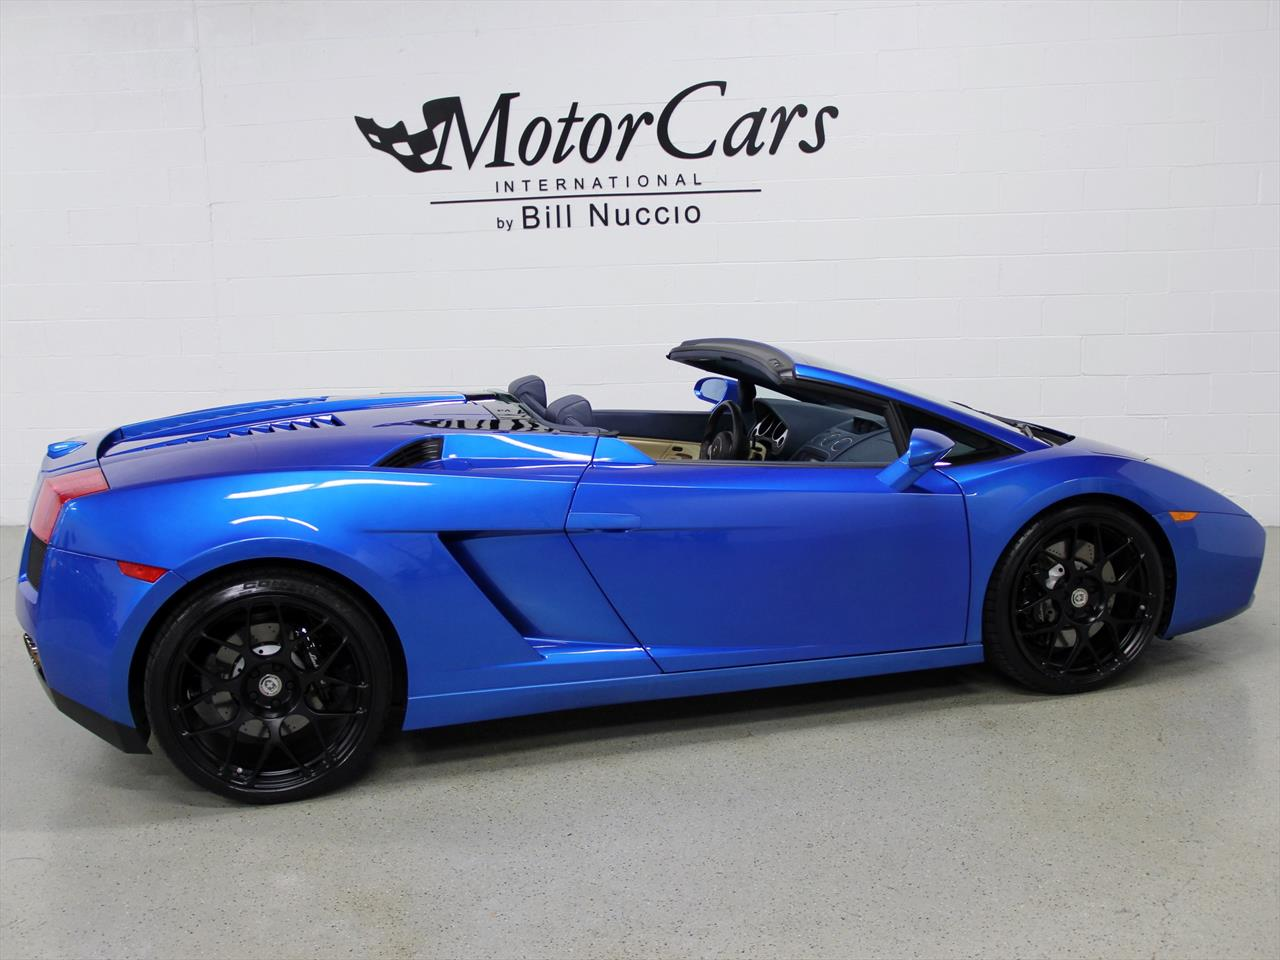 2007 Lamborghini Gallardo Spyder - Champion Motors ...   2007 Lamborghini Gallardo Spyder